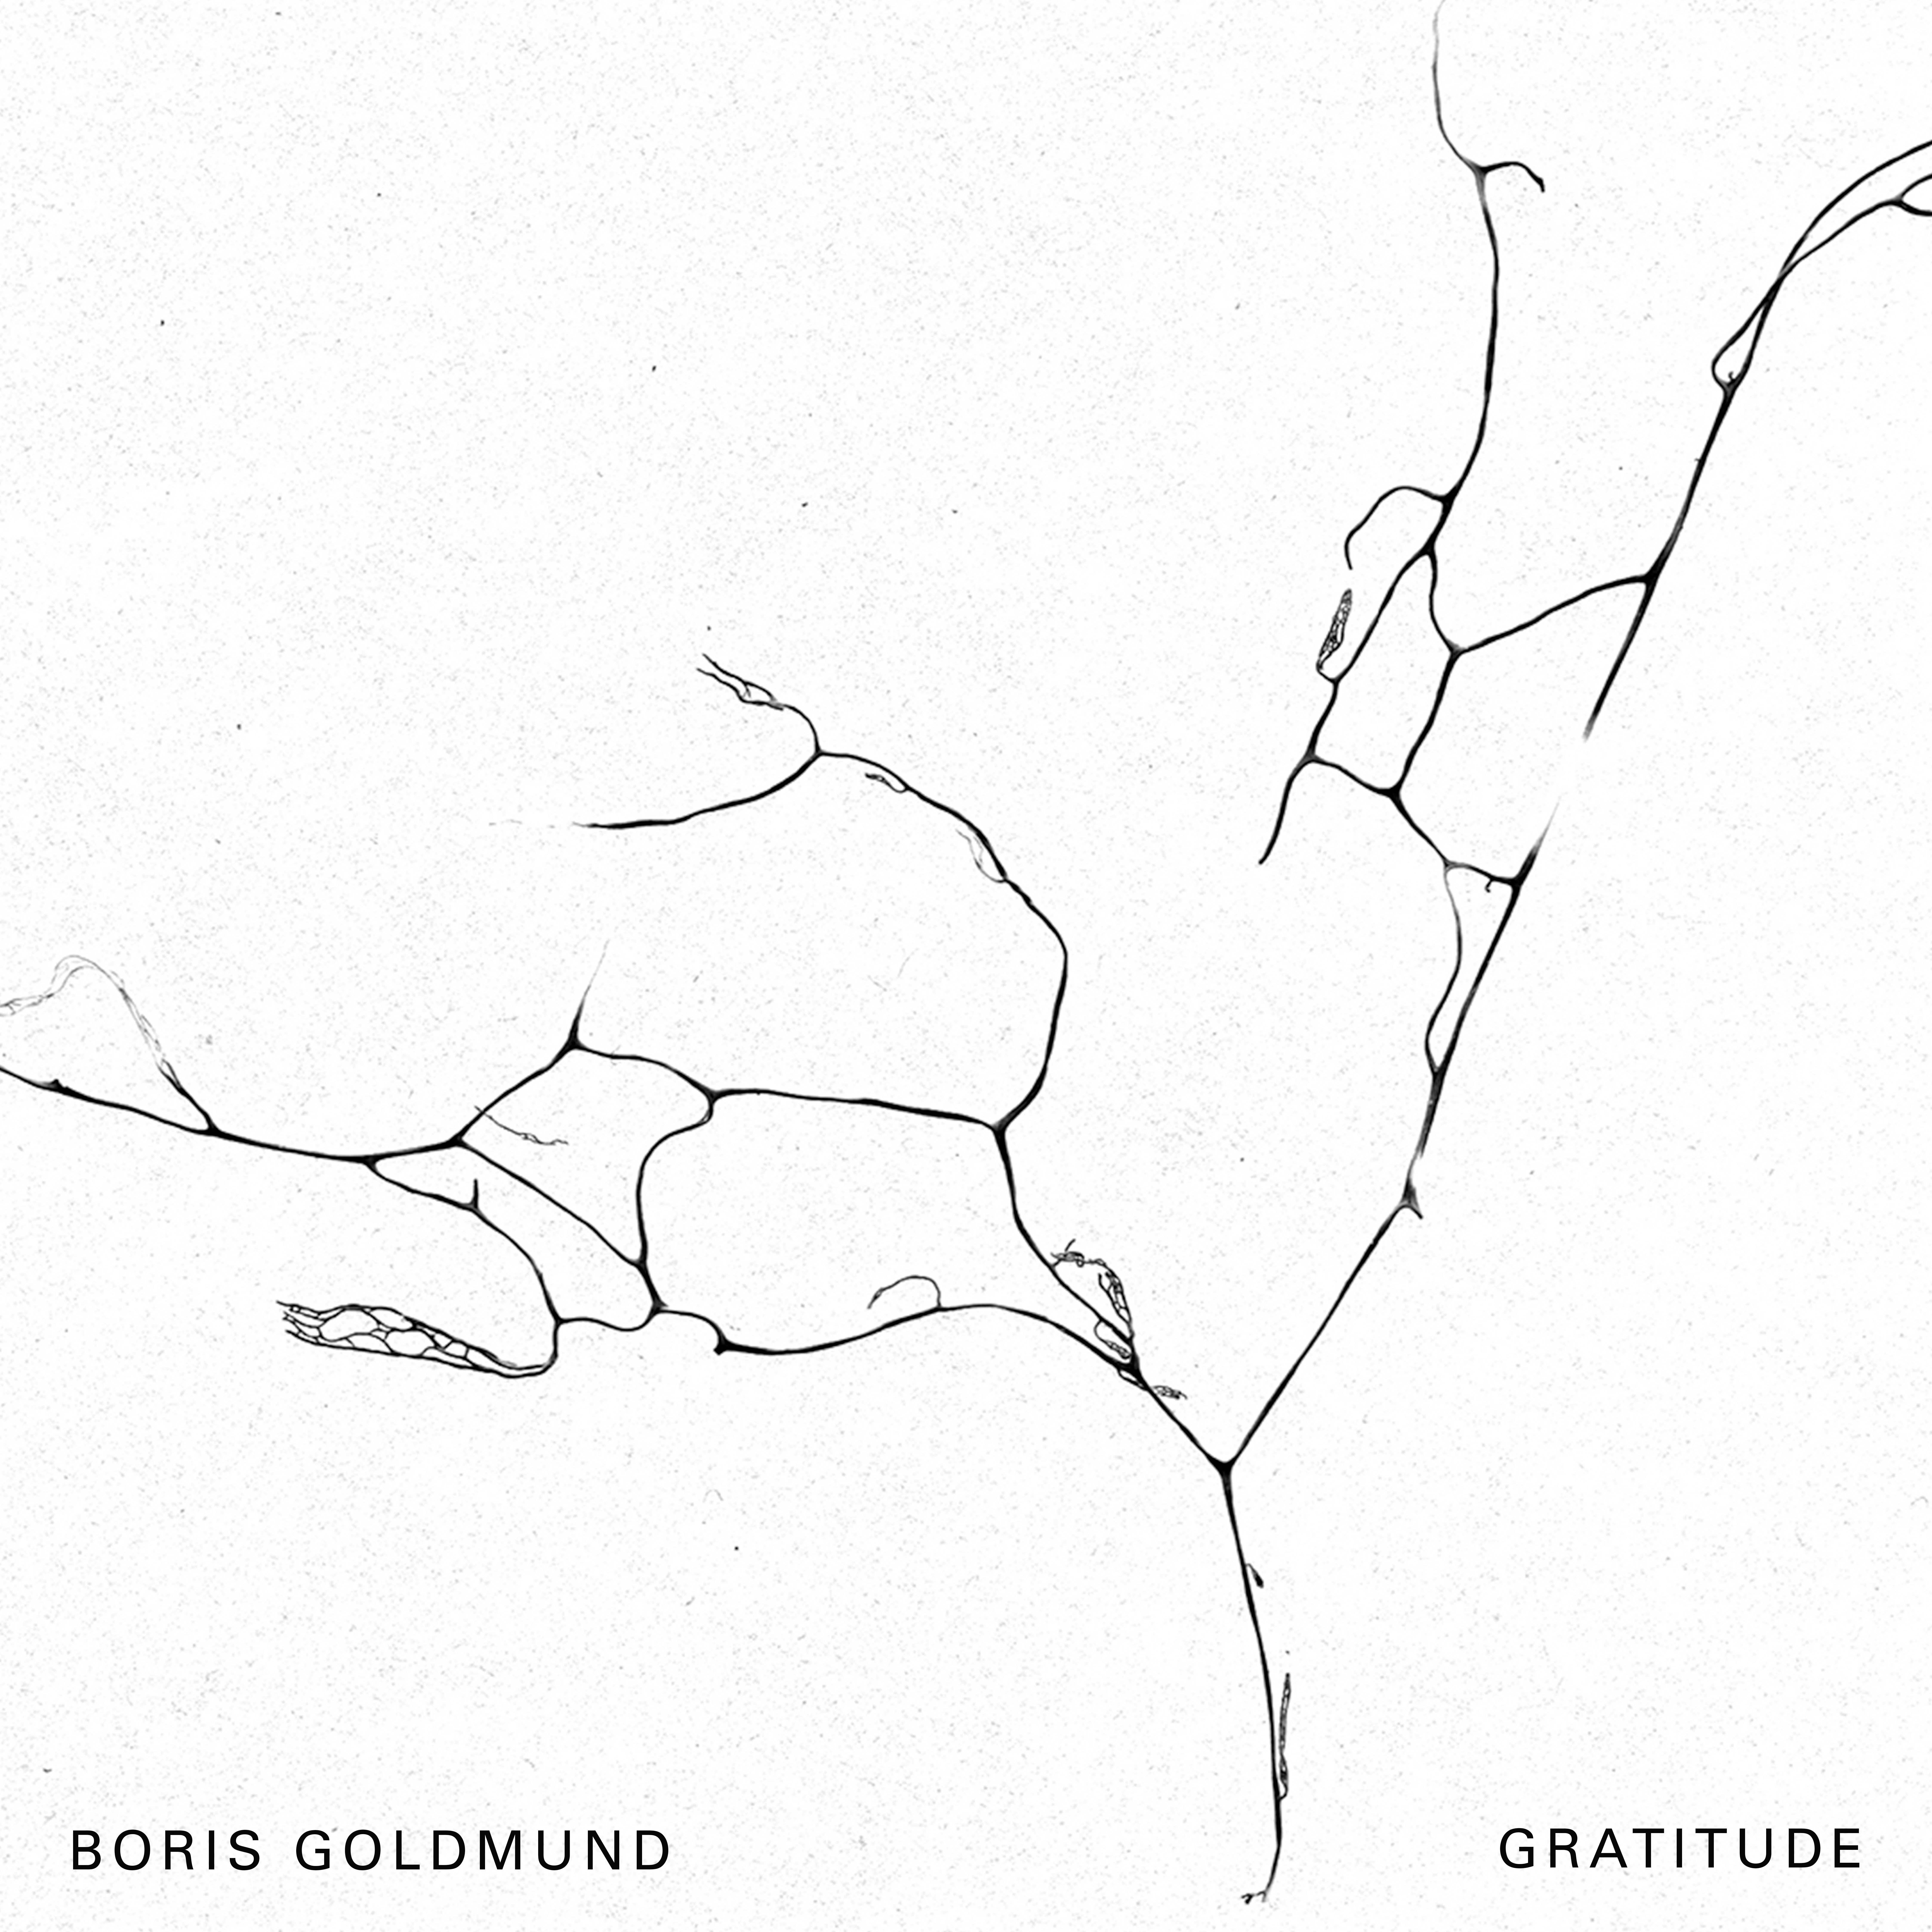 Album cover - ambient electric harp